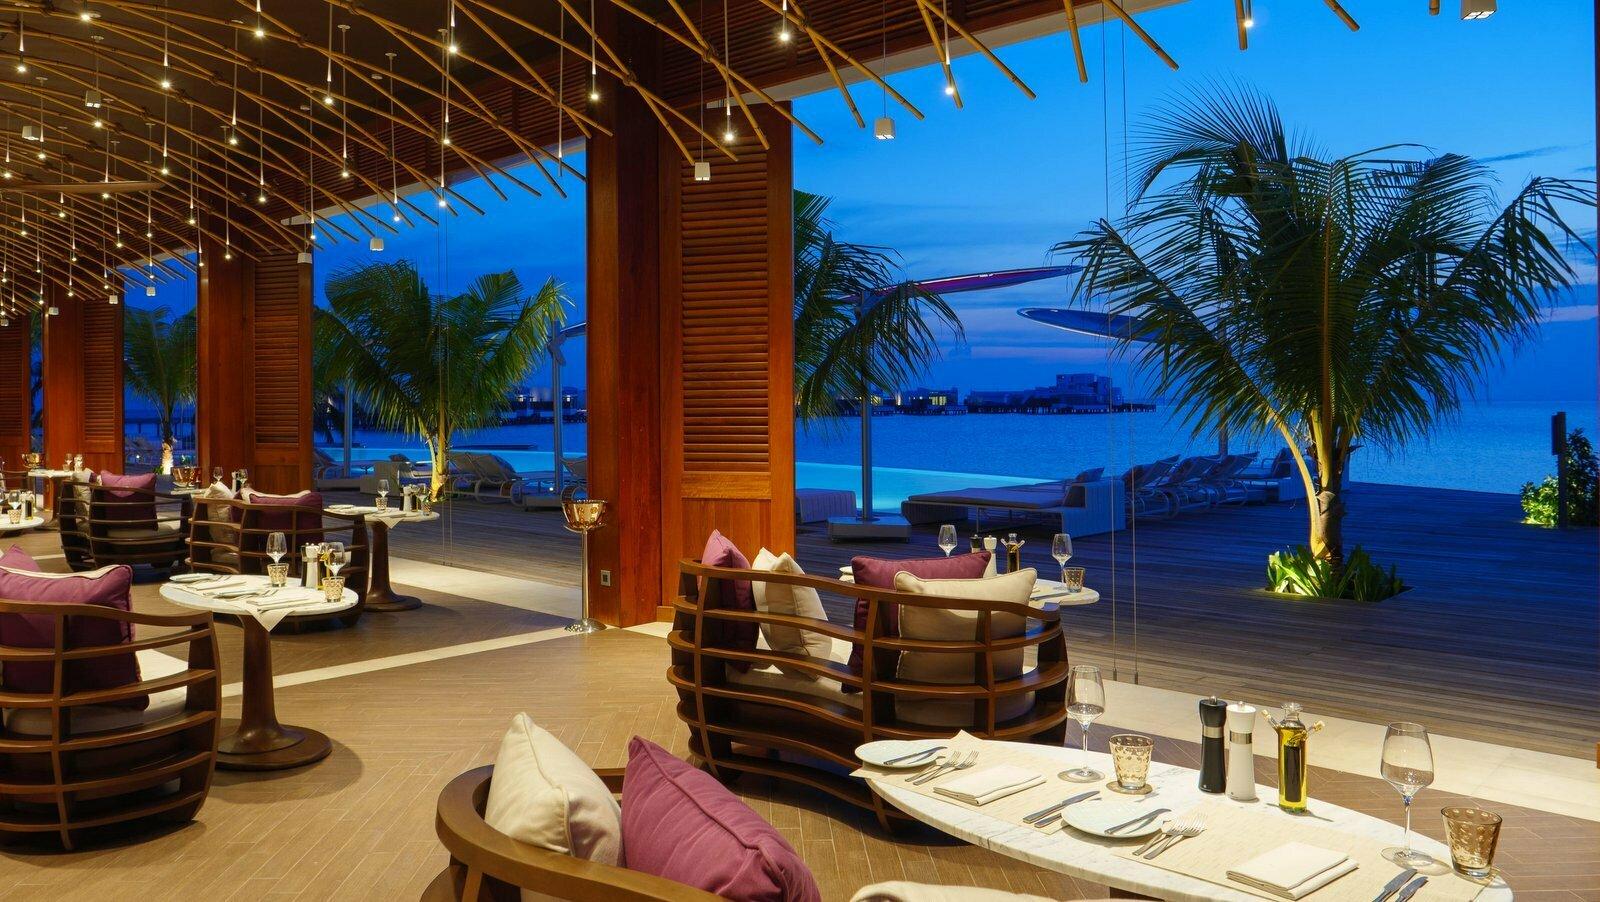 Мальдивы, отель LUX North Male Atoll, ресторан Glow